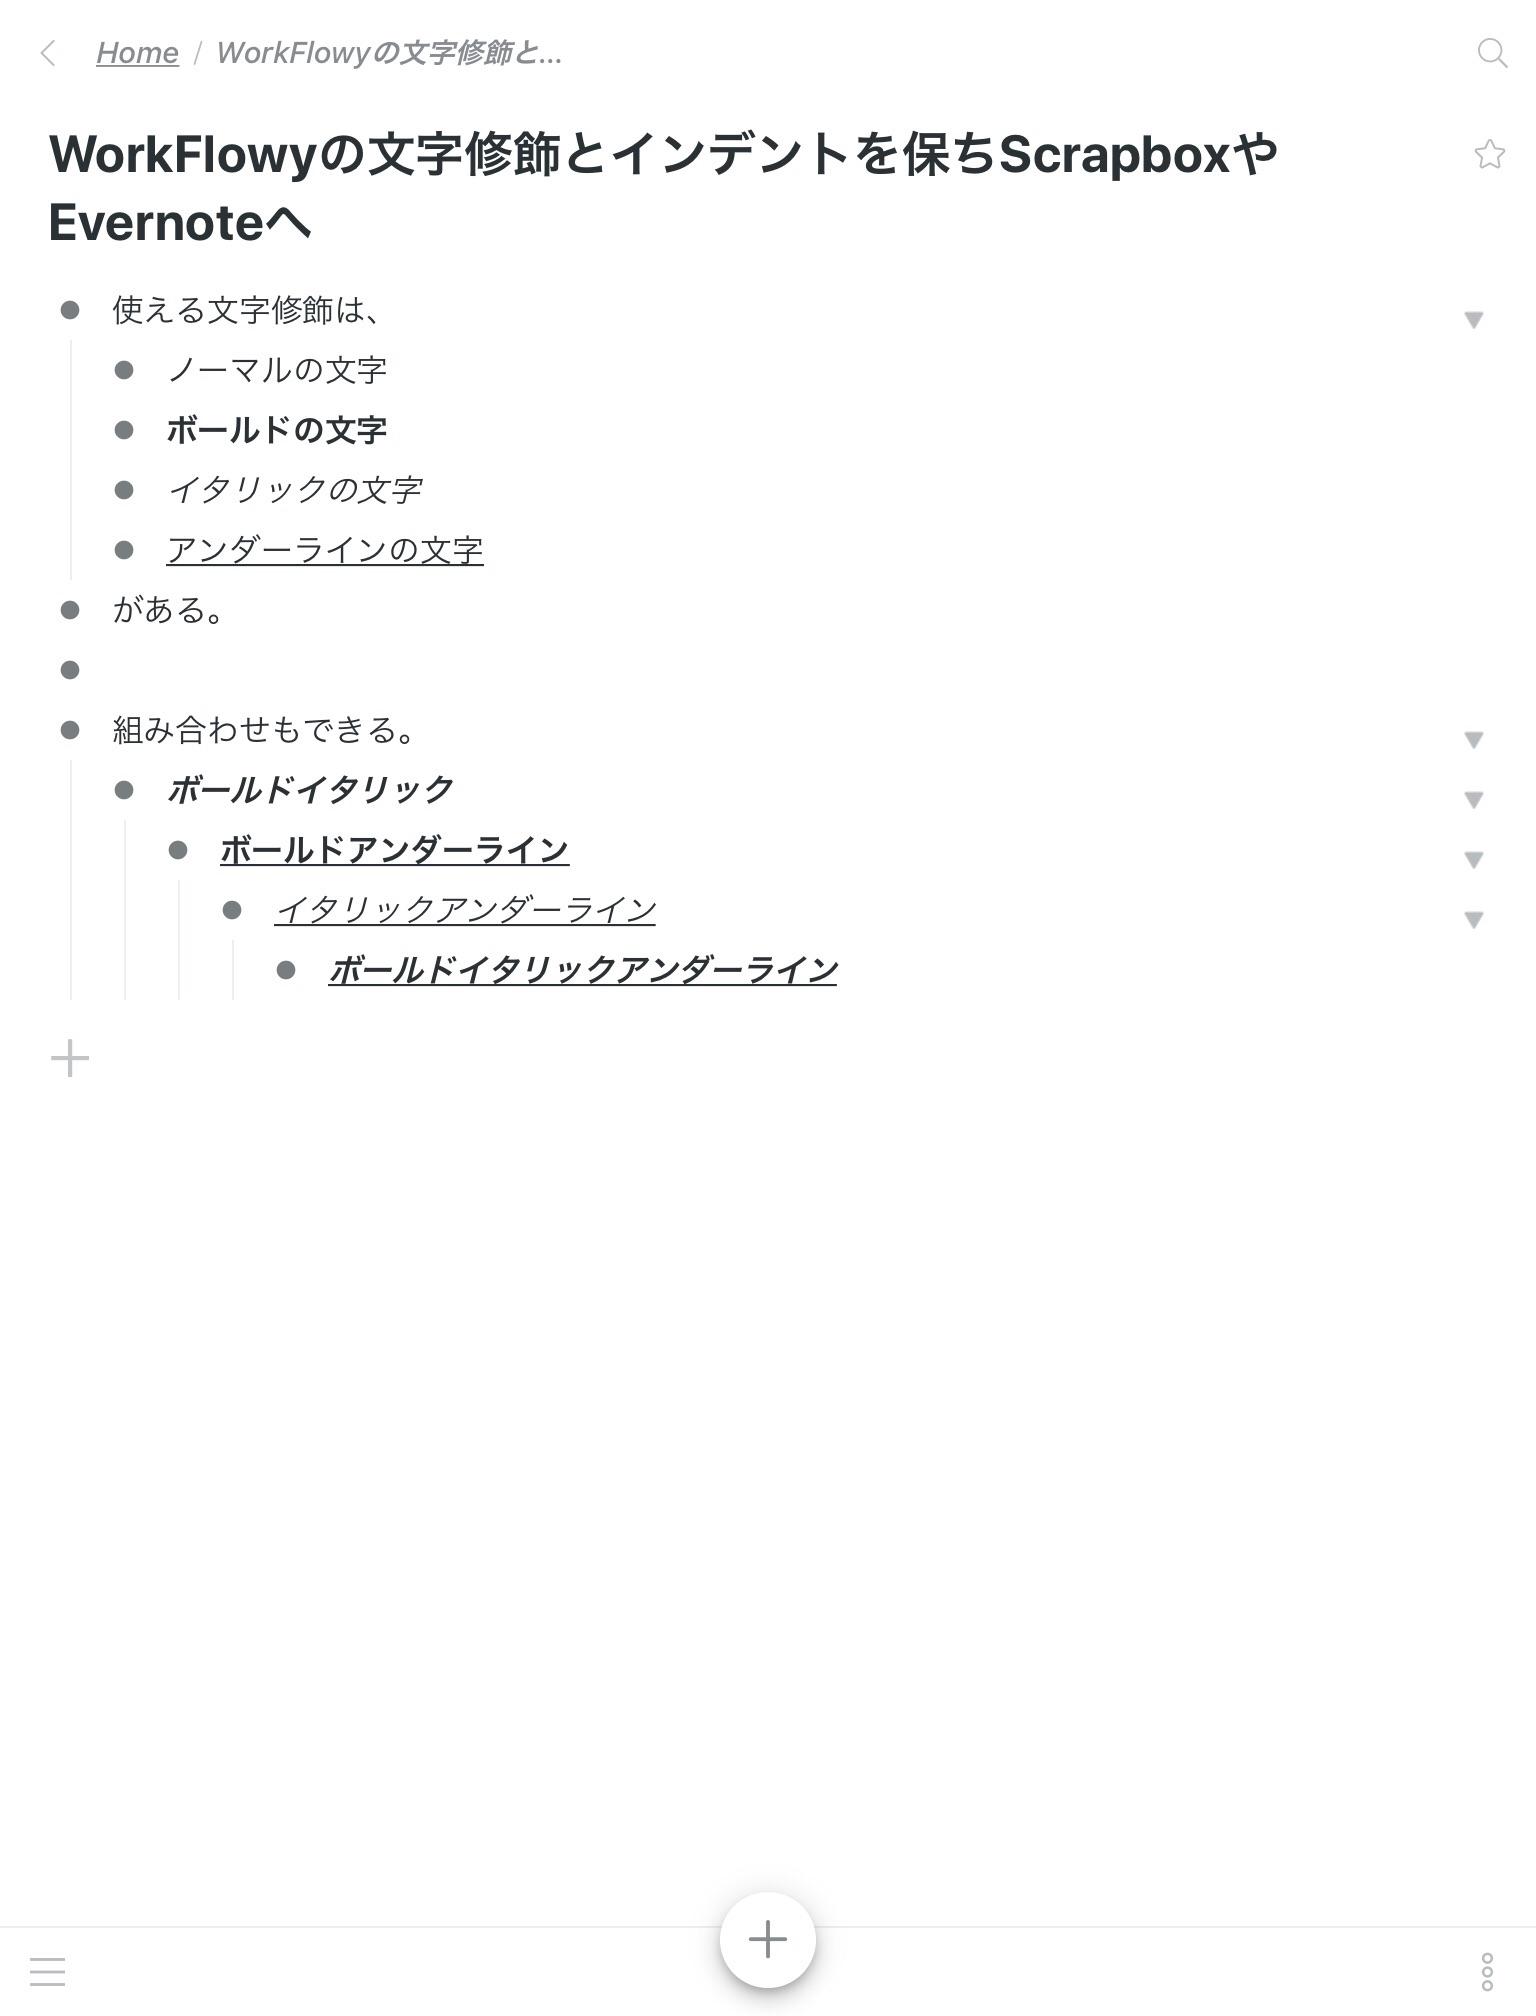 f:id:sorashima:20200731231517j:plain:w637